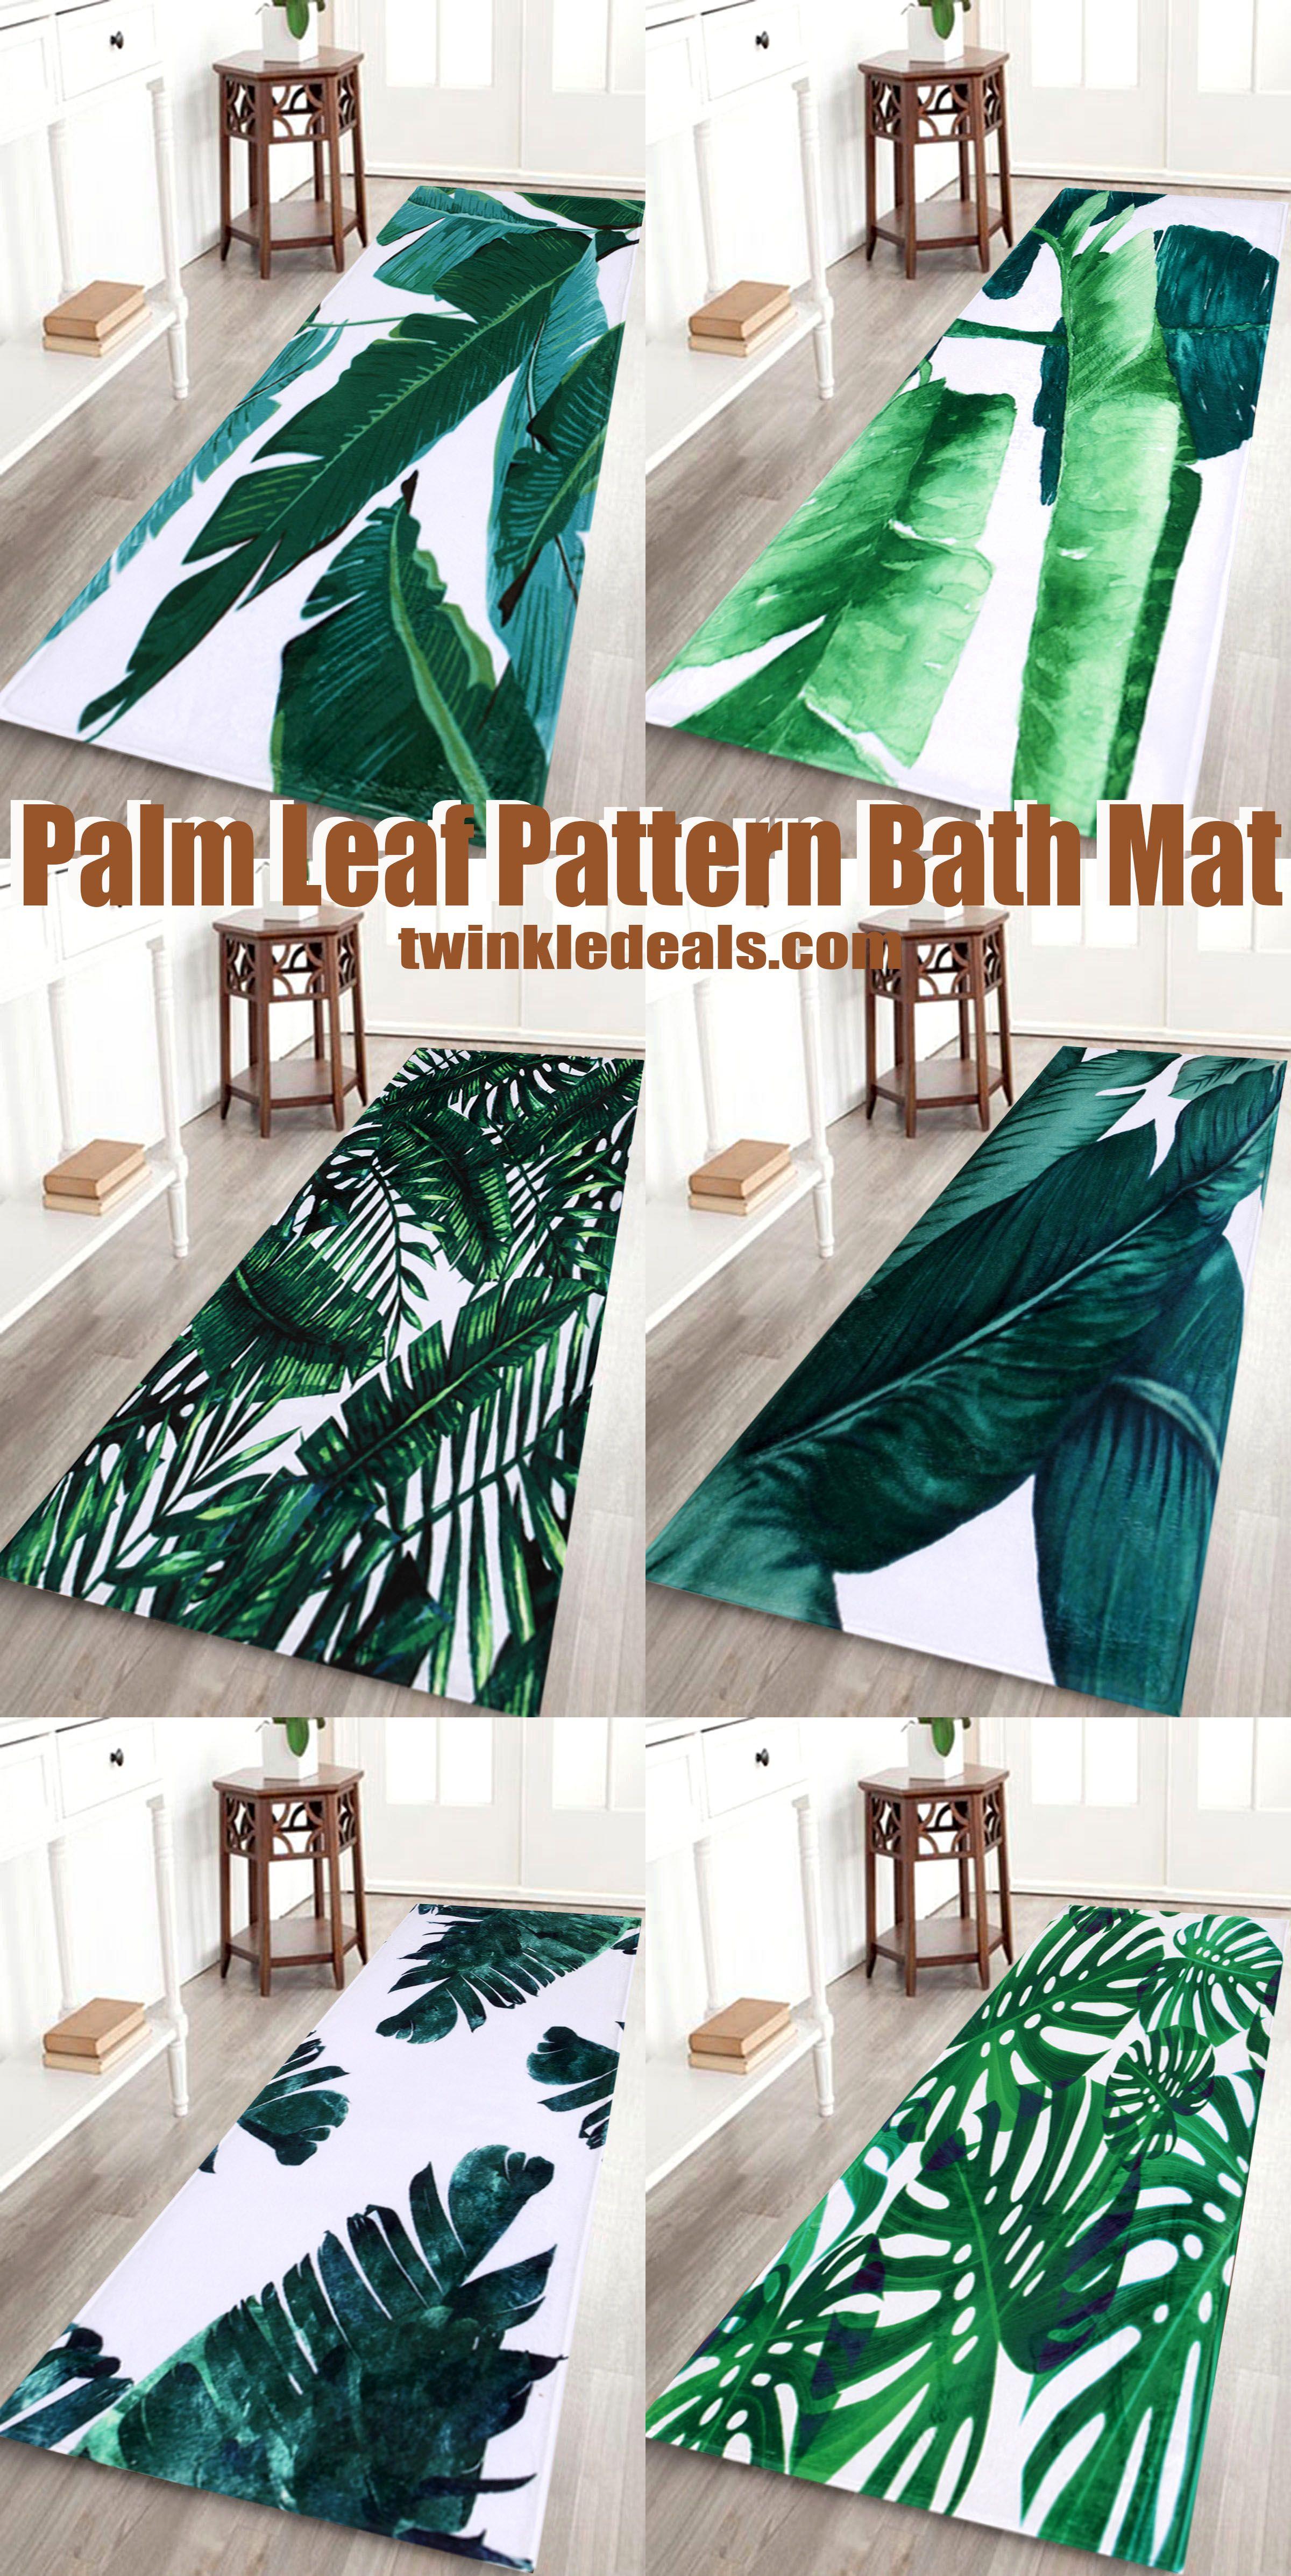 Palm leaf pattern bath mat sisustus pinterest bath mat palm